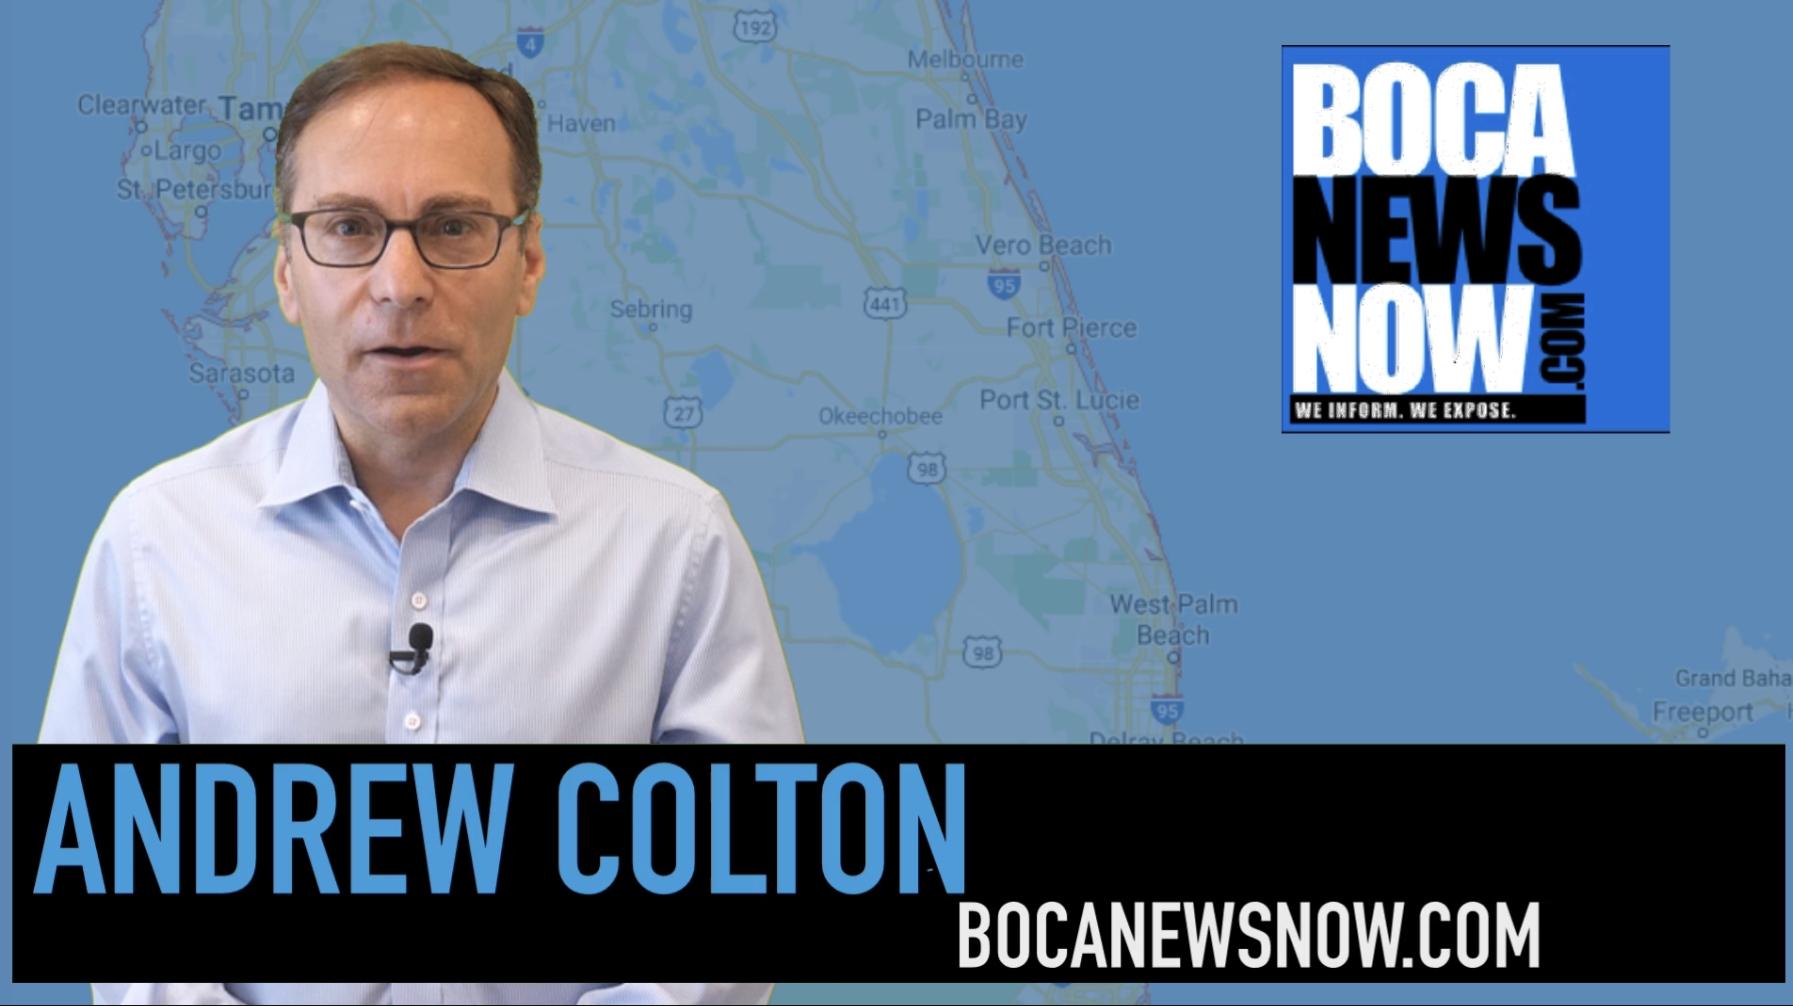 Andrew Colton TV News